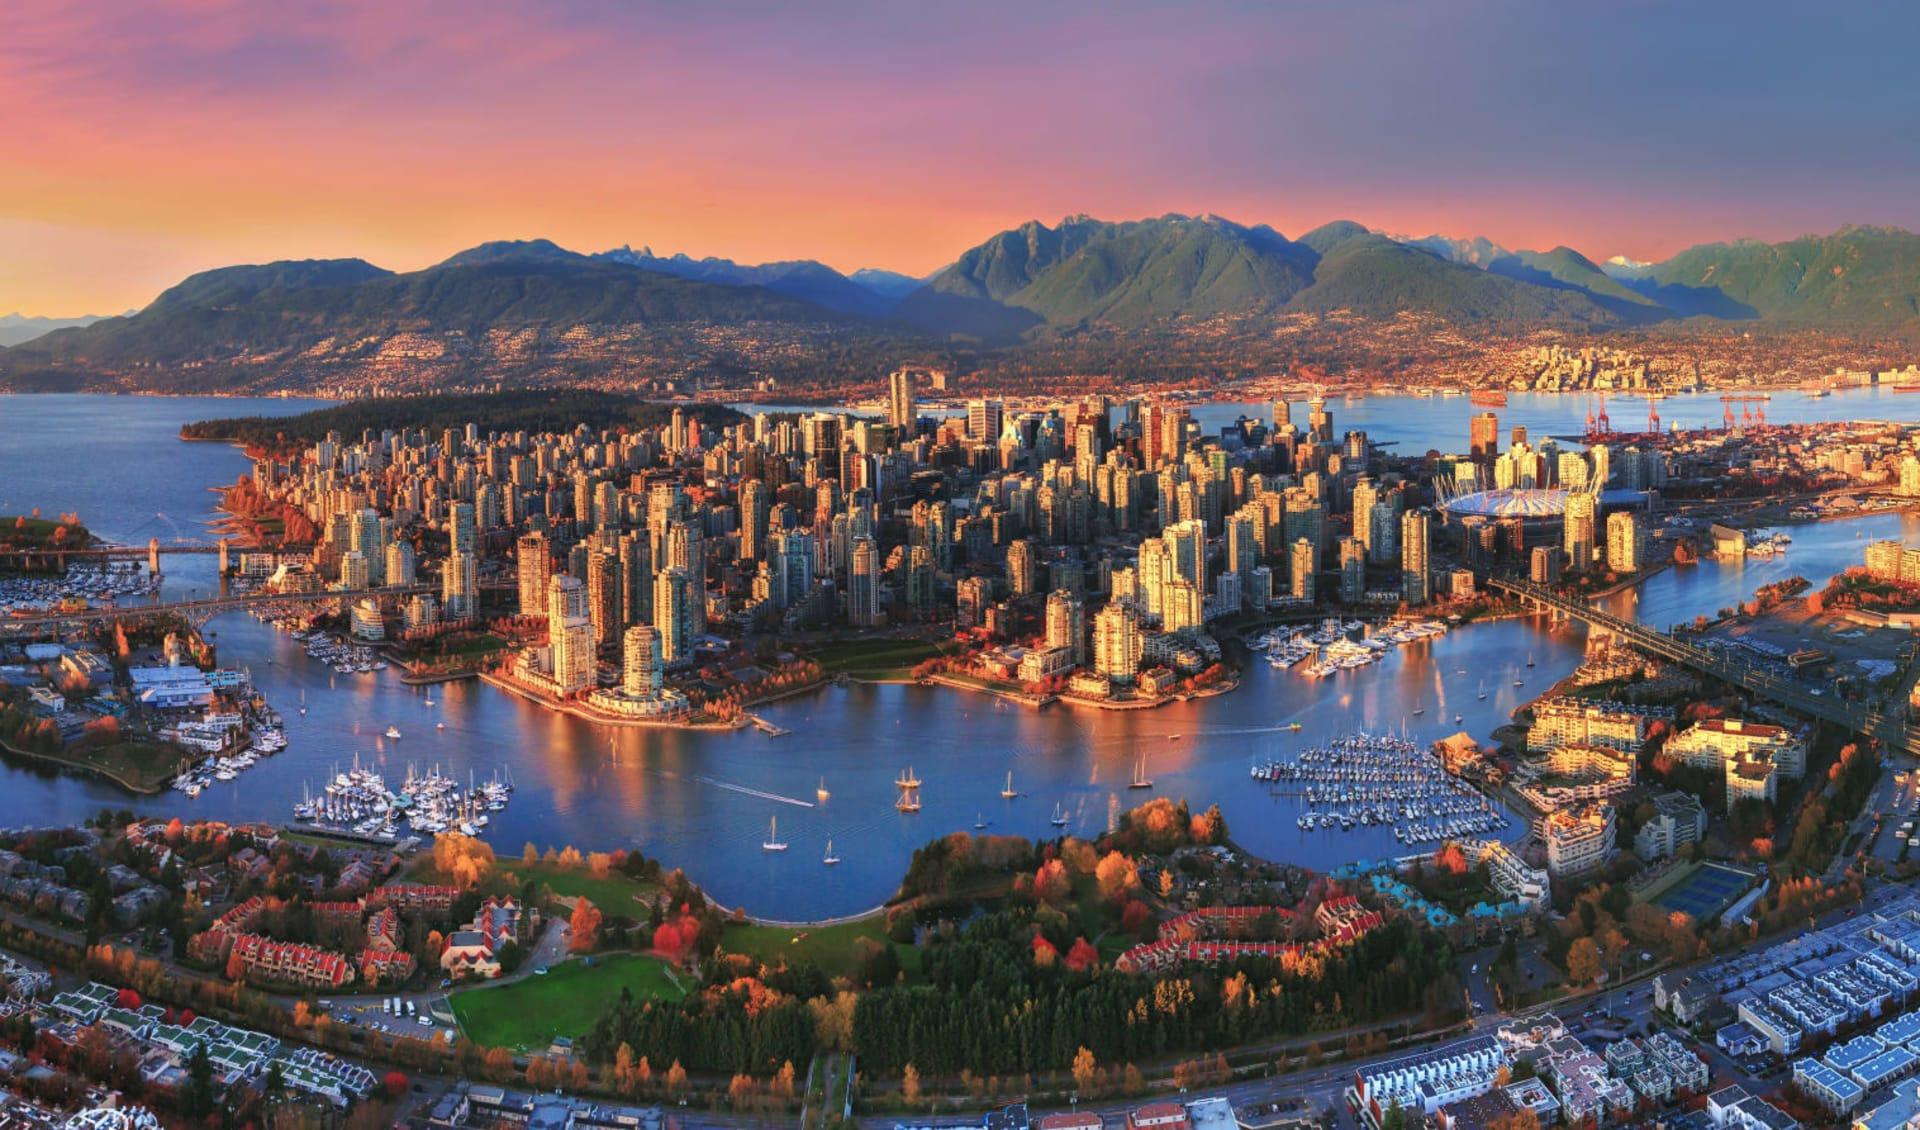 Wanderrundreise von Lodge zu Lodge ab Calgary: Canada - British Columbia - Vancouver Aerial Sunset